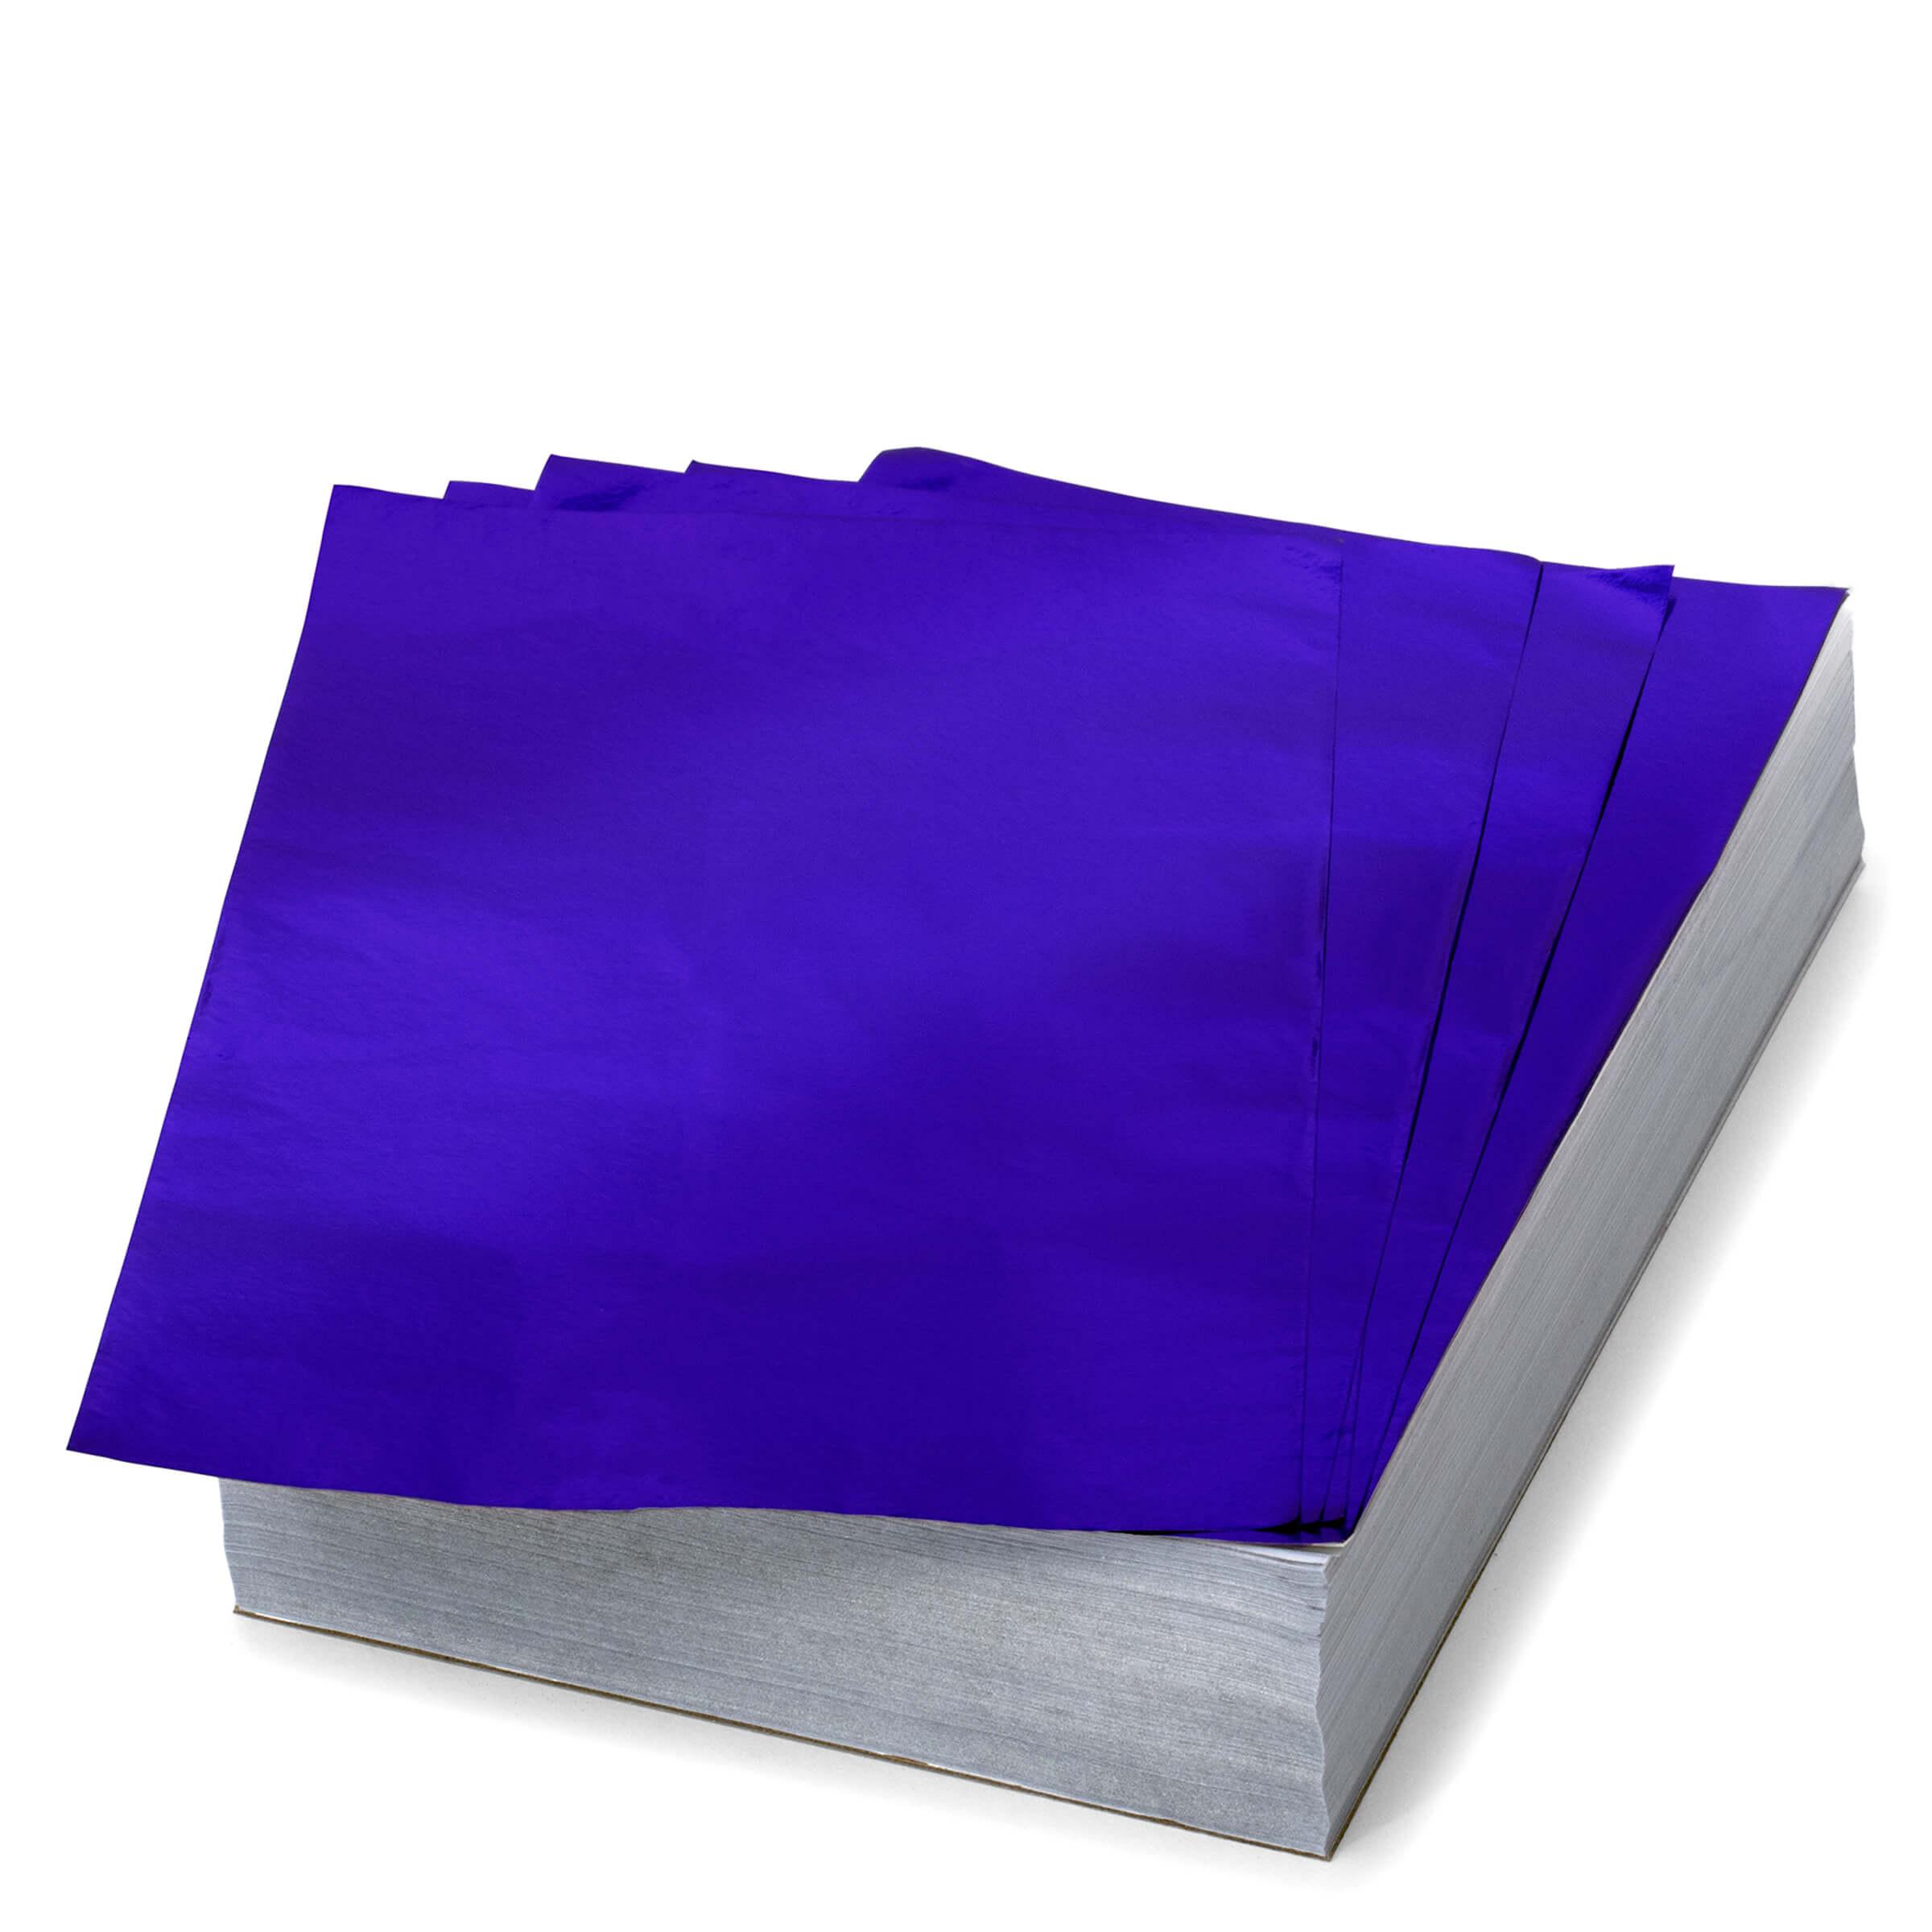 AL-58-60DB-a-5x8-smooth-foil-medium-dark-blue-l.jpg